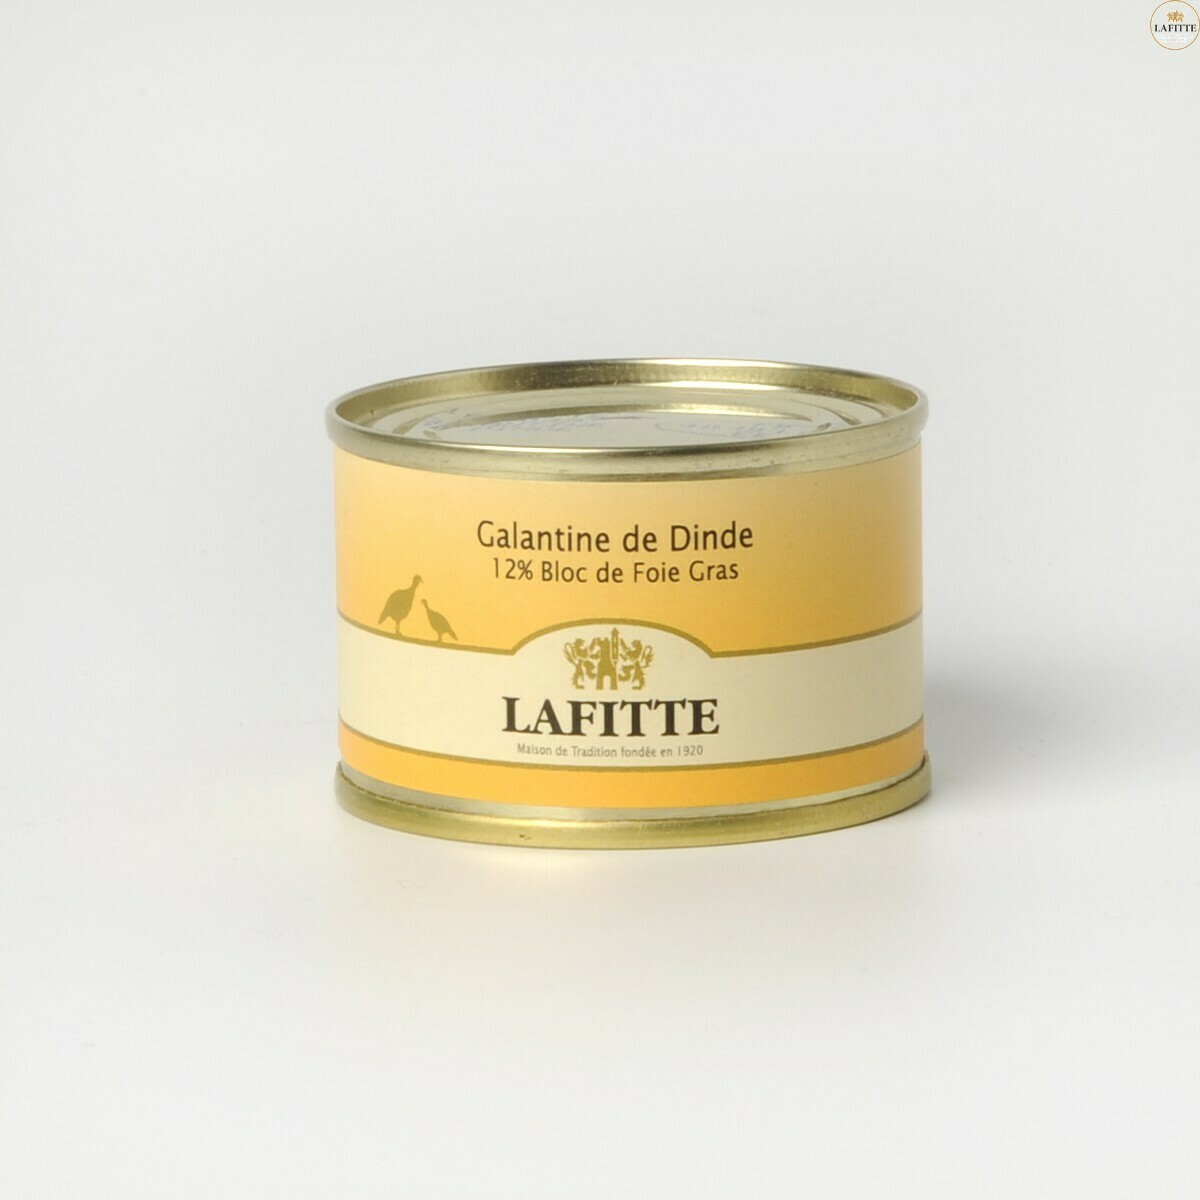 Krůtí galantina, 12% Bloc Foie Gras, 65g